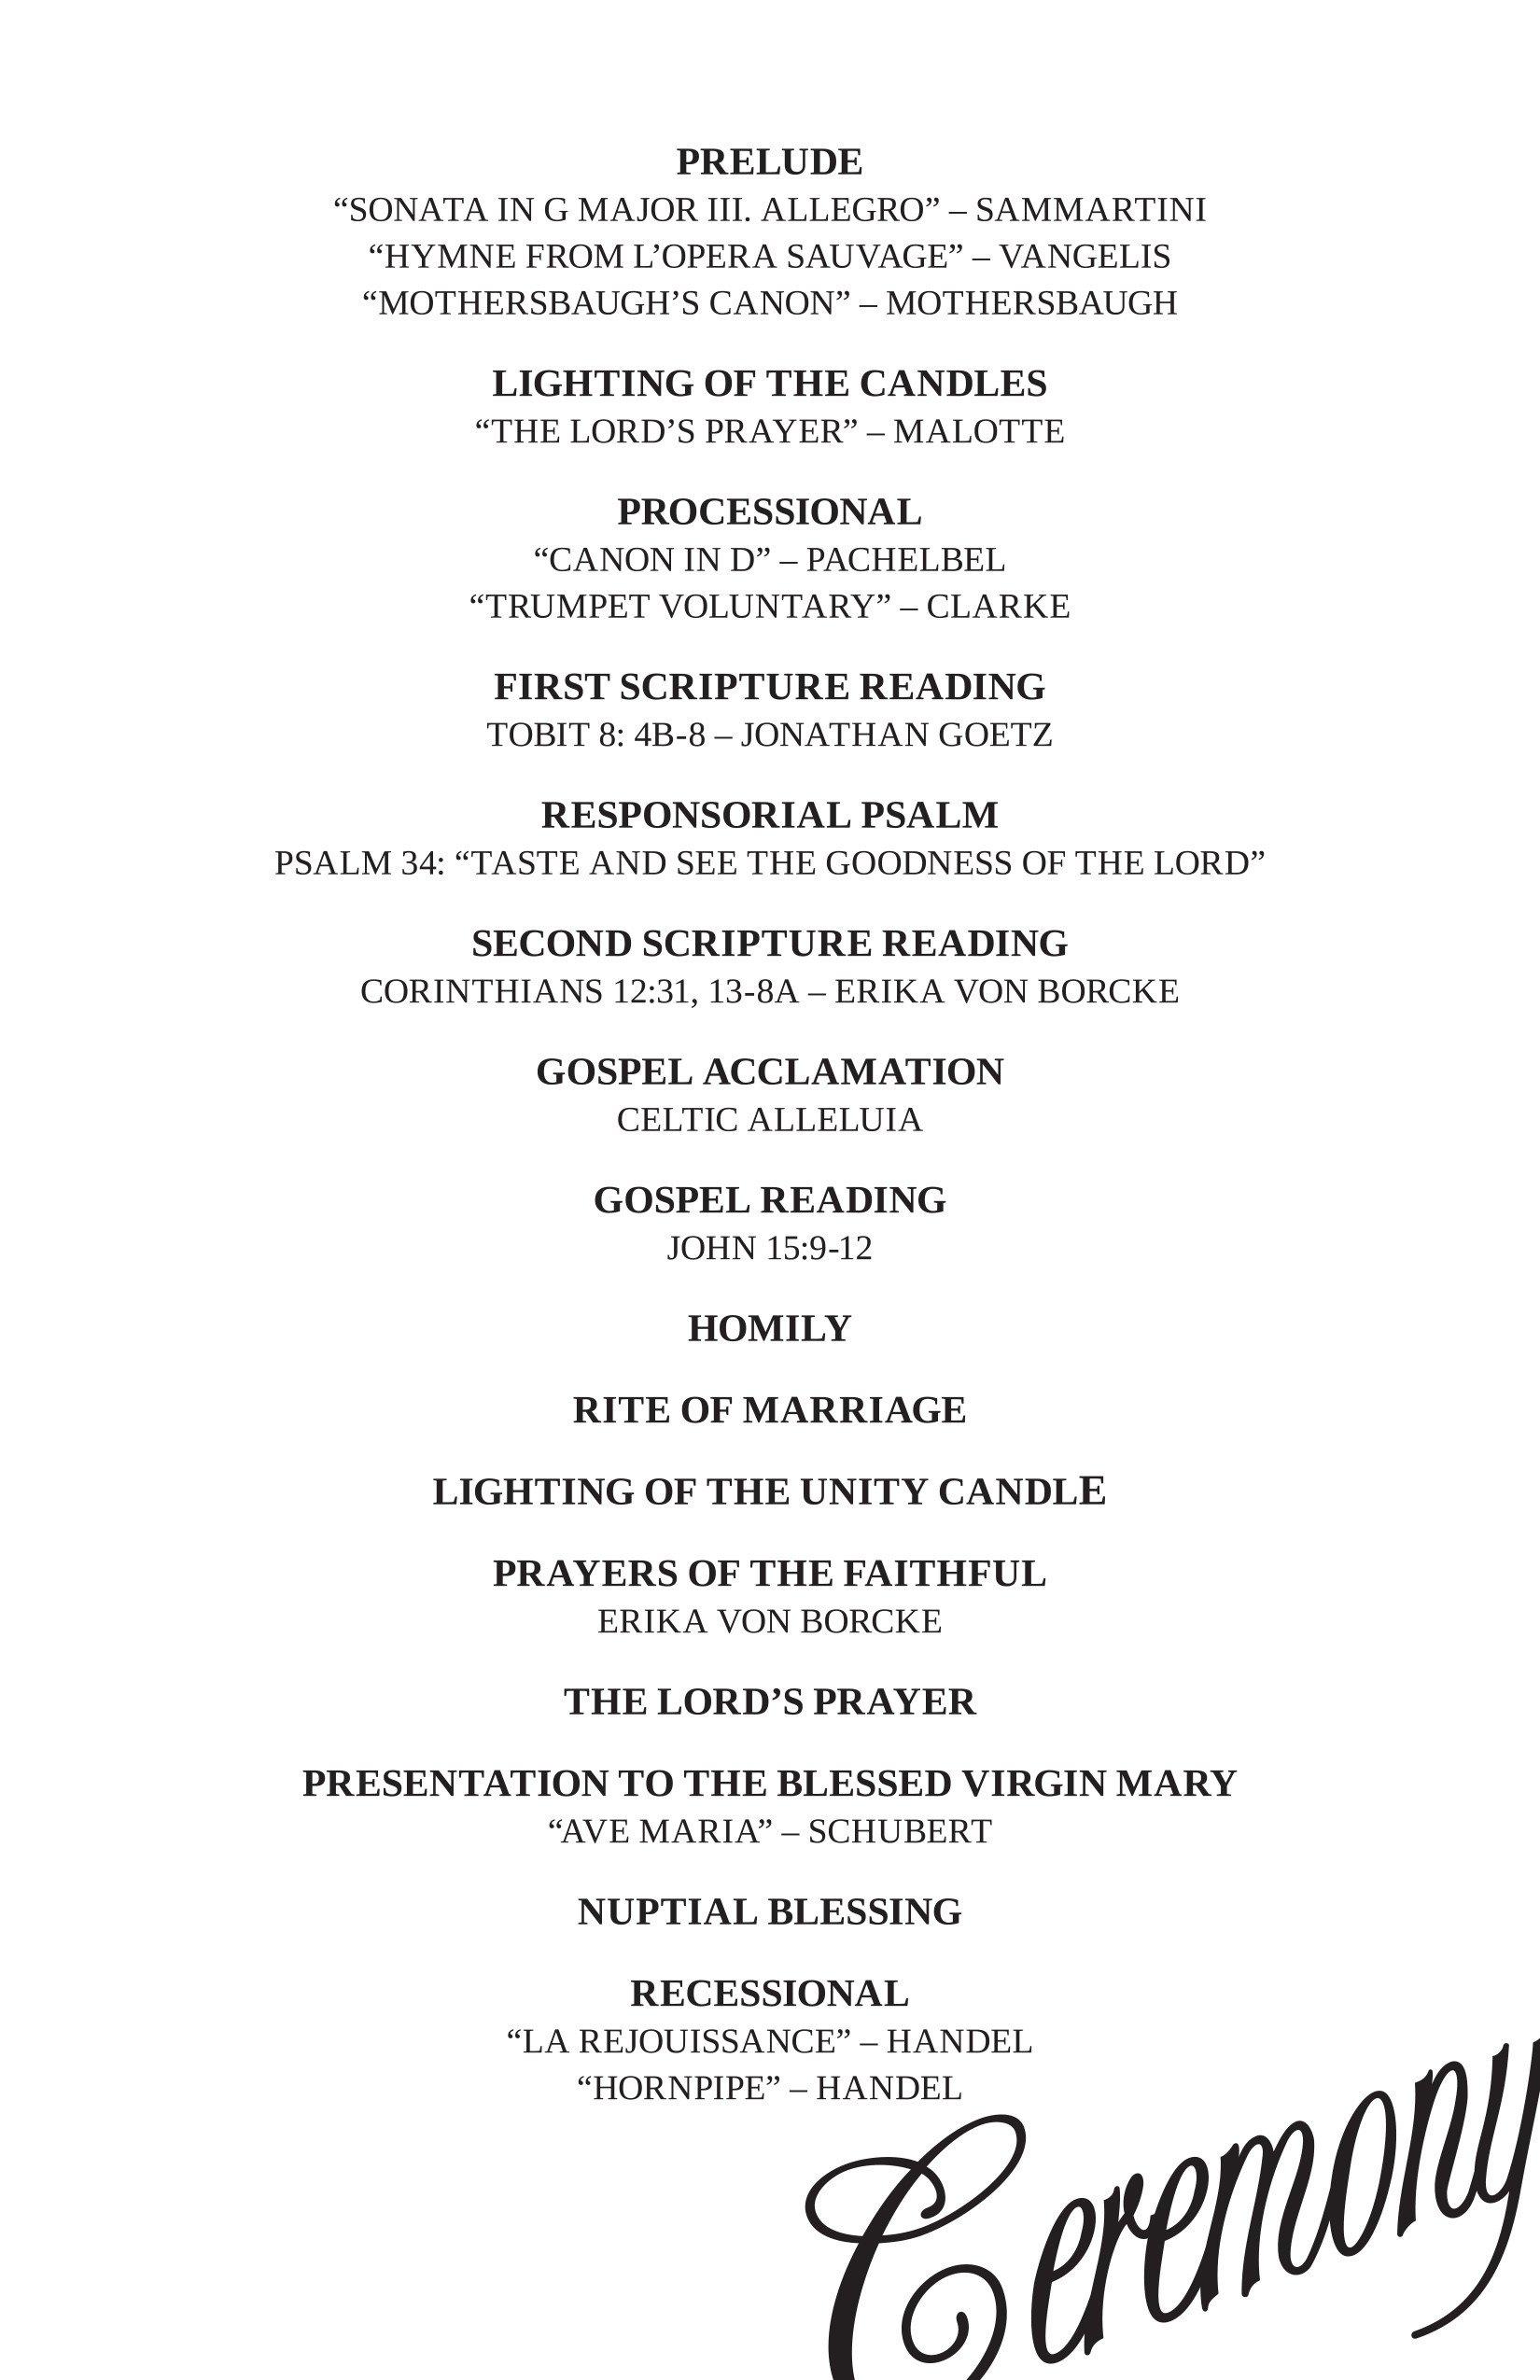 Wedding Reception Program Template Wedding Reception Program Ideas Wedding Decor Ideas